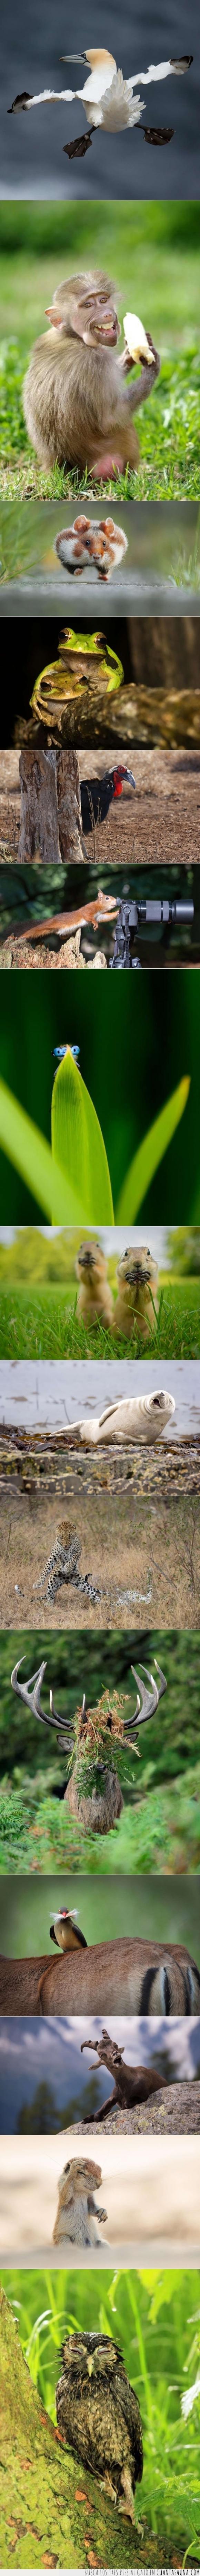 ardilla,Ave,brillantes,cabra,Comedy Wildlife Photography Awards,divertidos,foca,hamster,lechuza,leopardo,mono,mosca,sapo,venado,vida silvestre